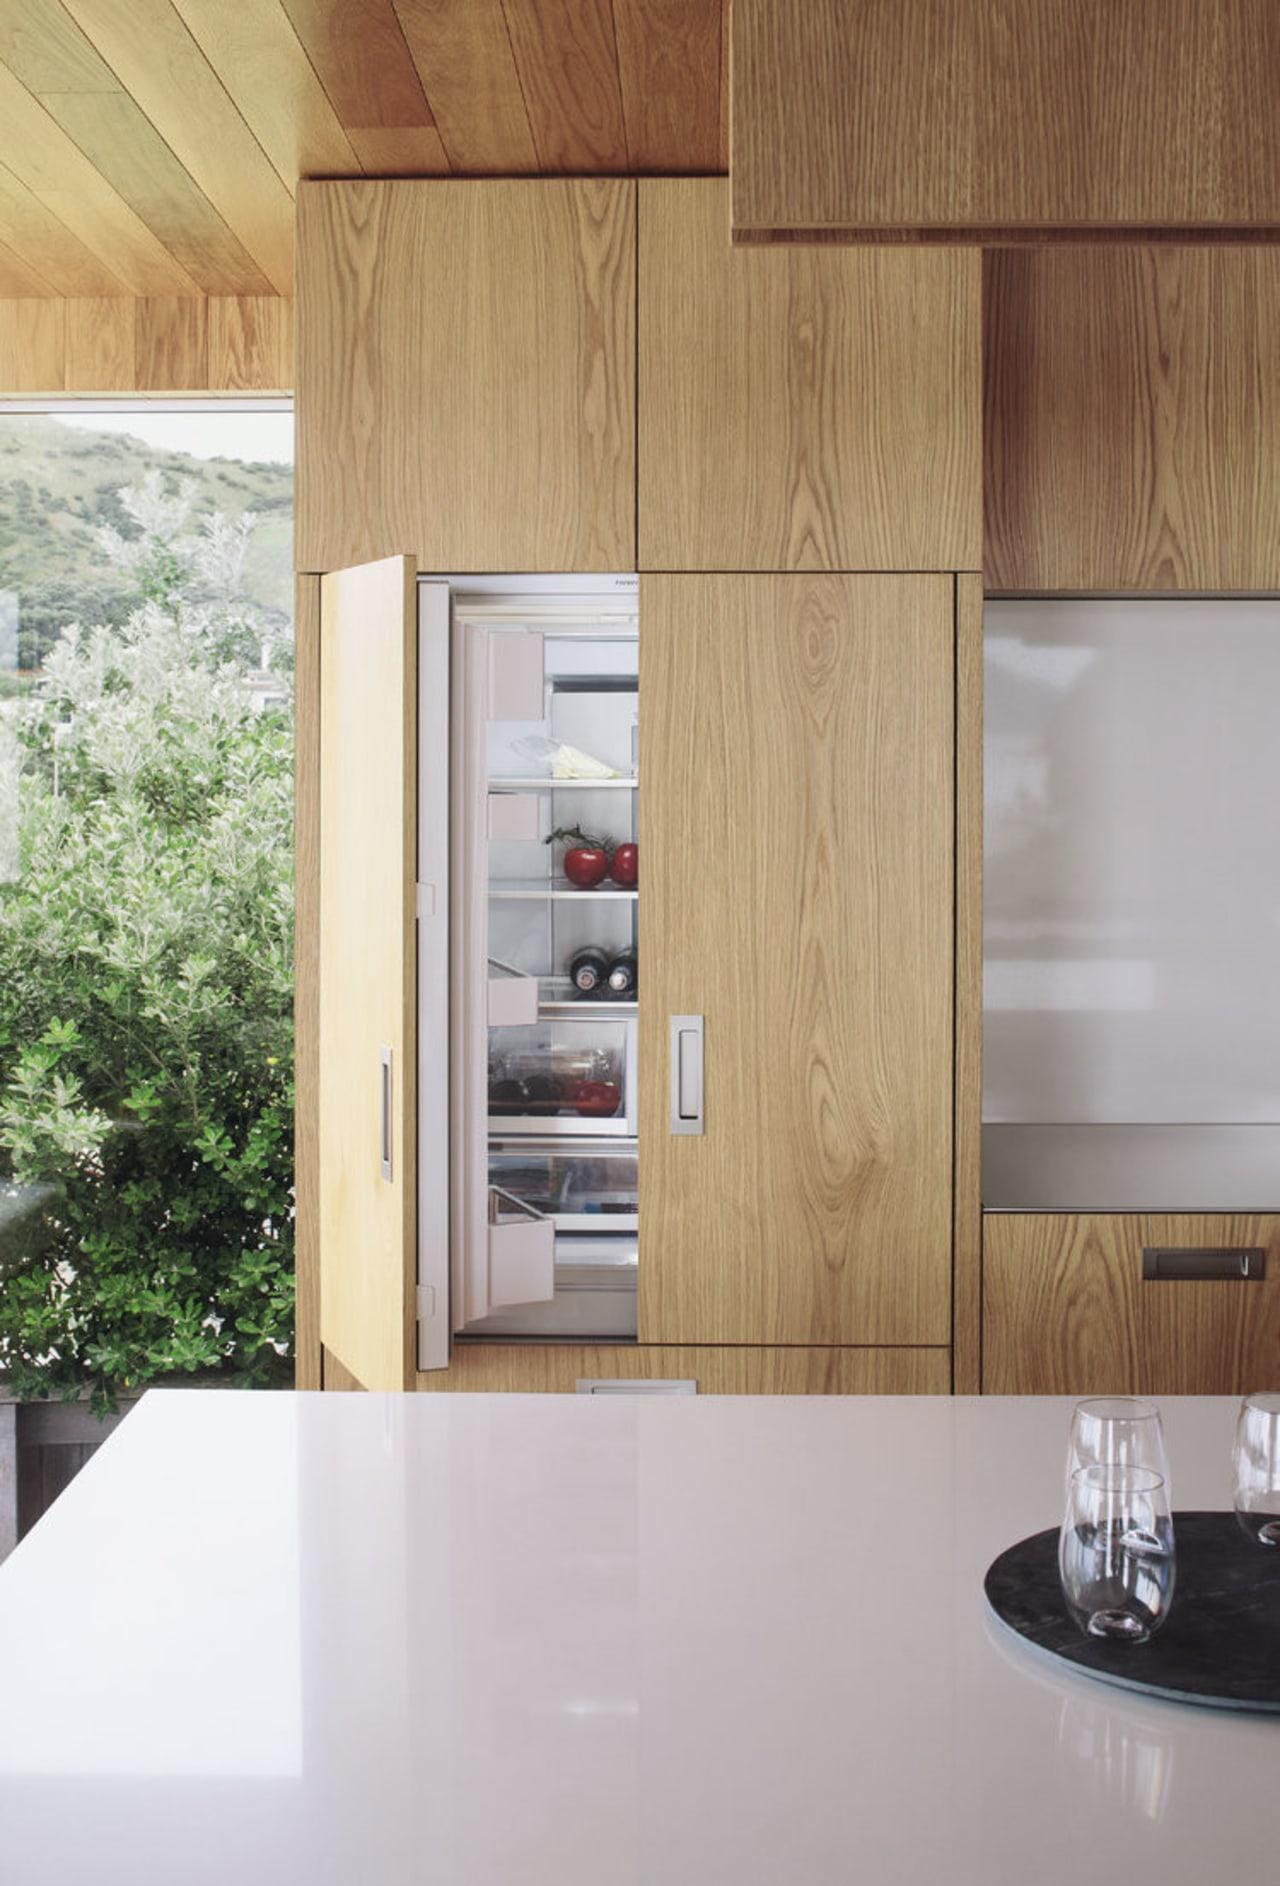 Studio2 hahei house fridge appliances -